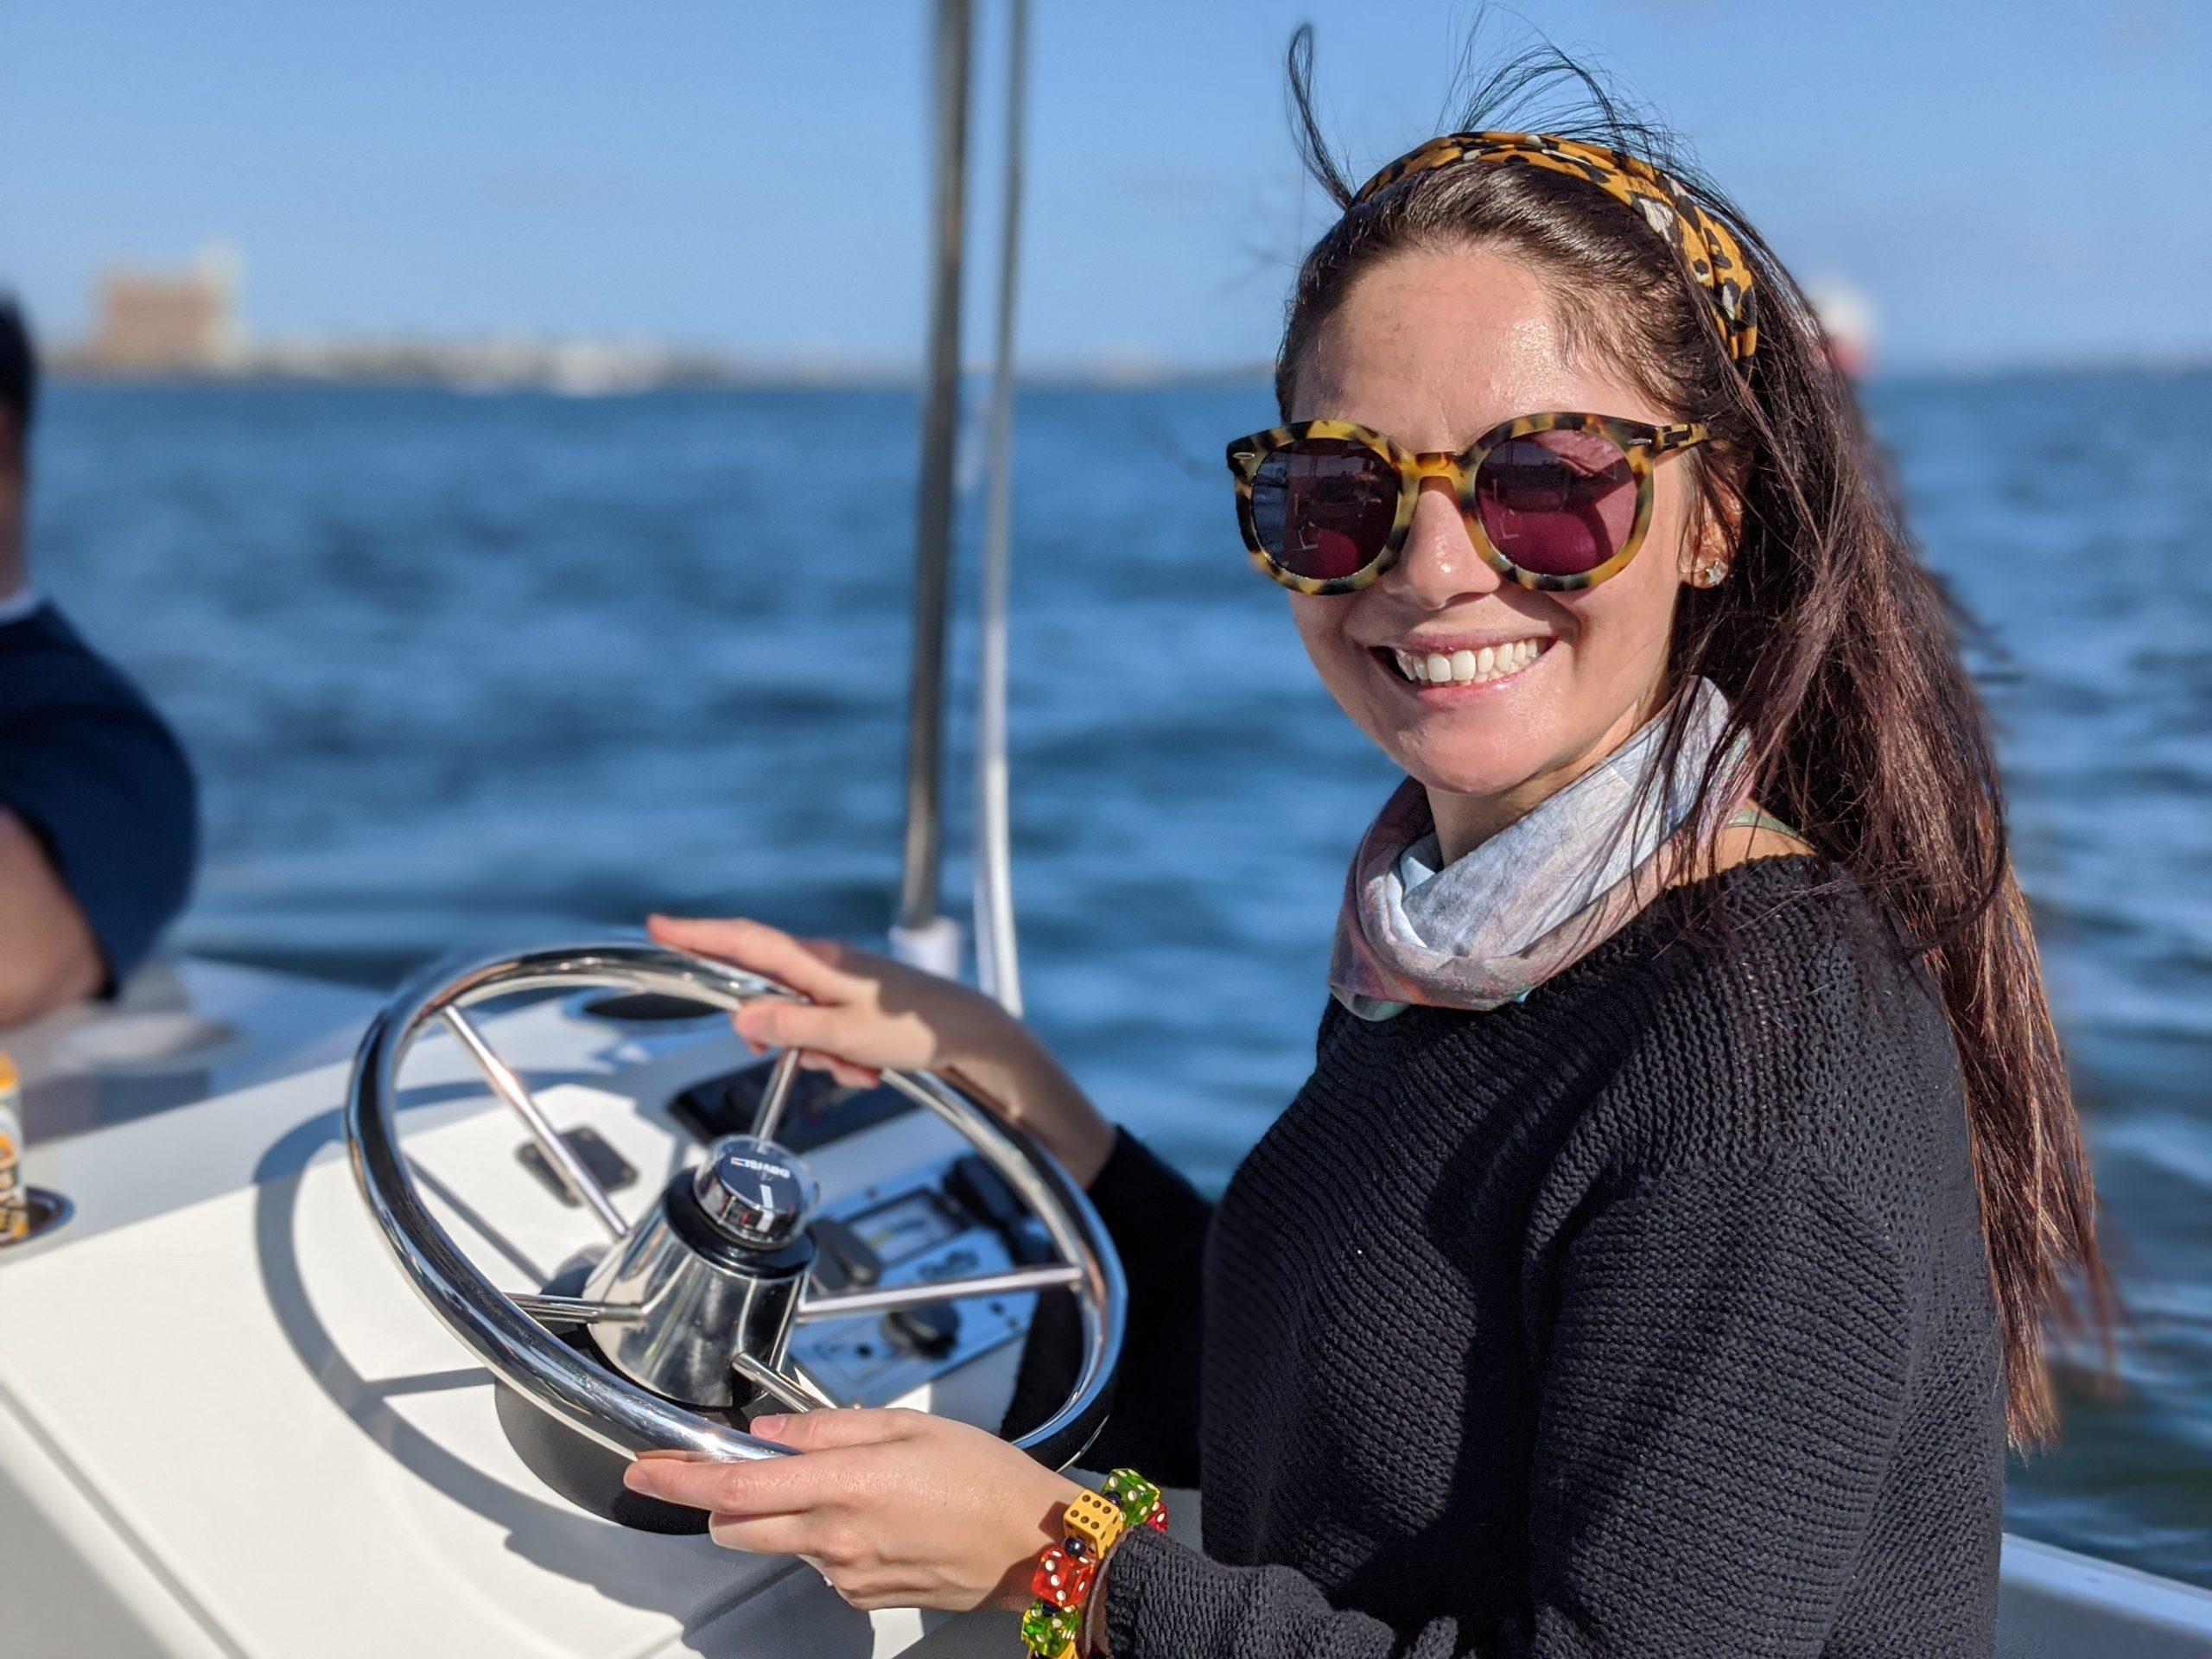 Boston Electric Boats   Capture the experience of cruising Boston Harbor